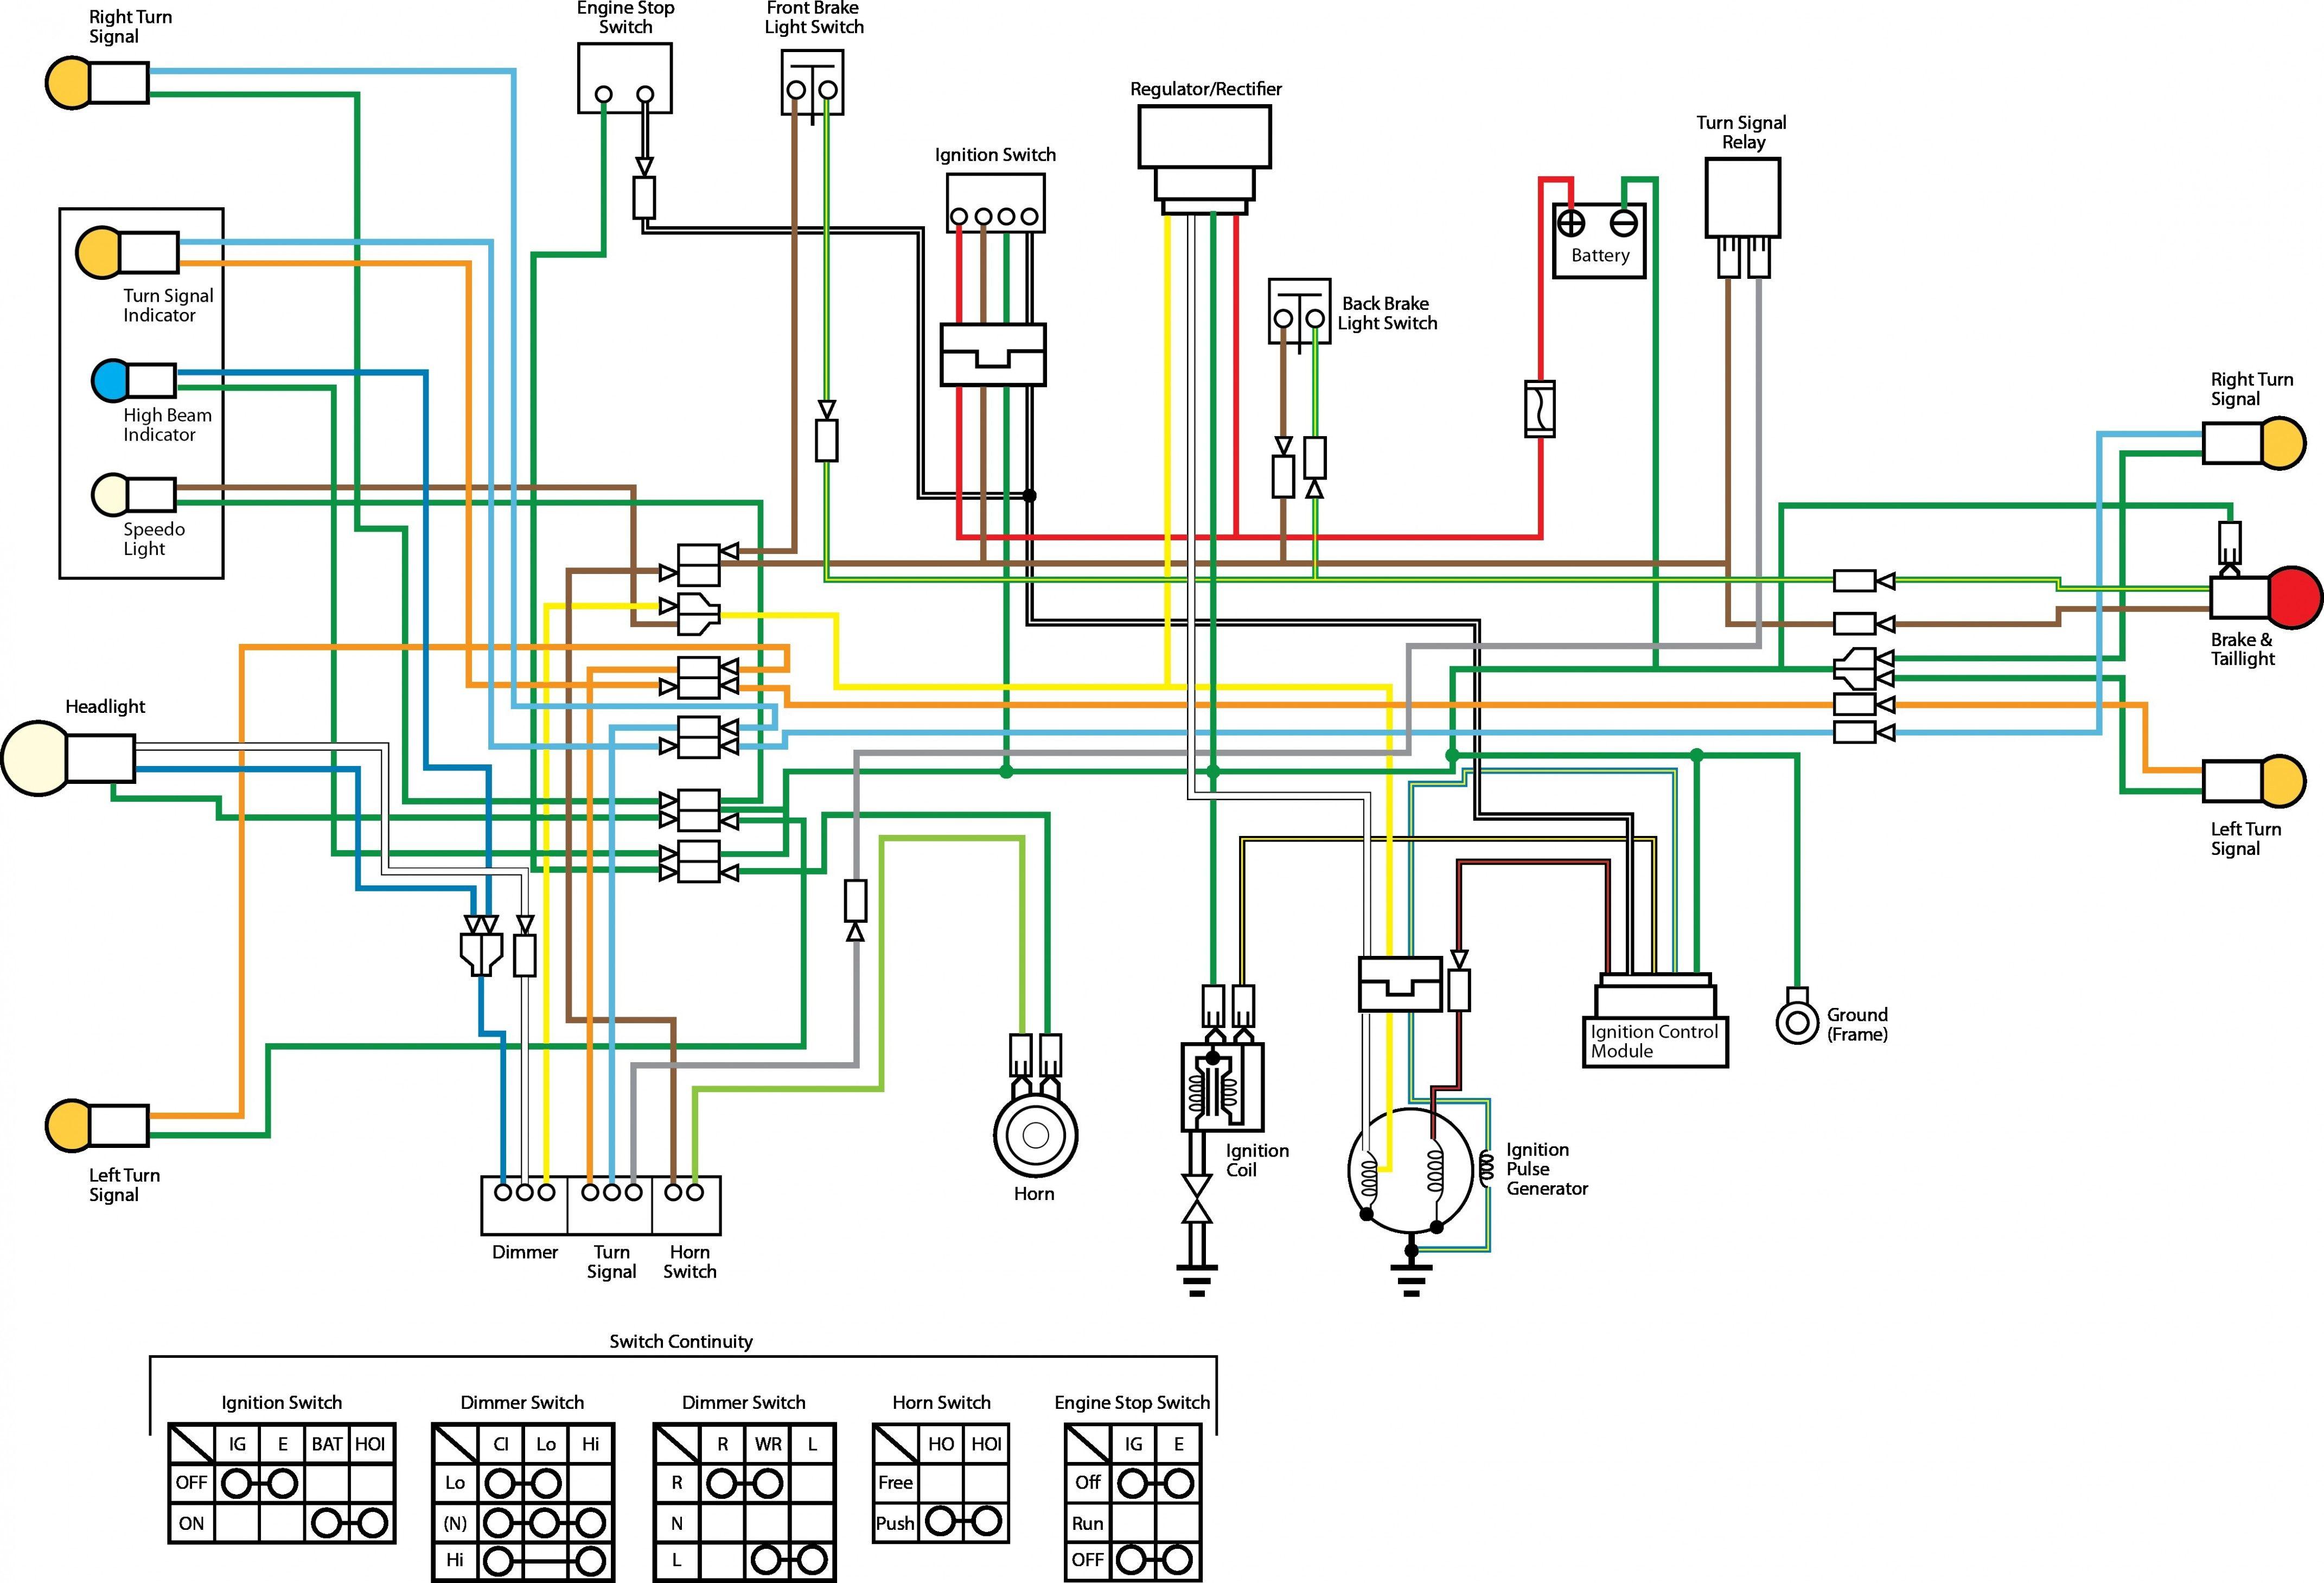 Gy5 5cc Engine Diagram Wiring In 2020